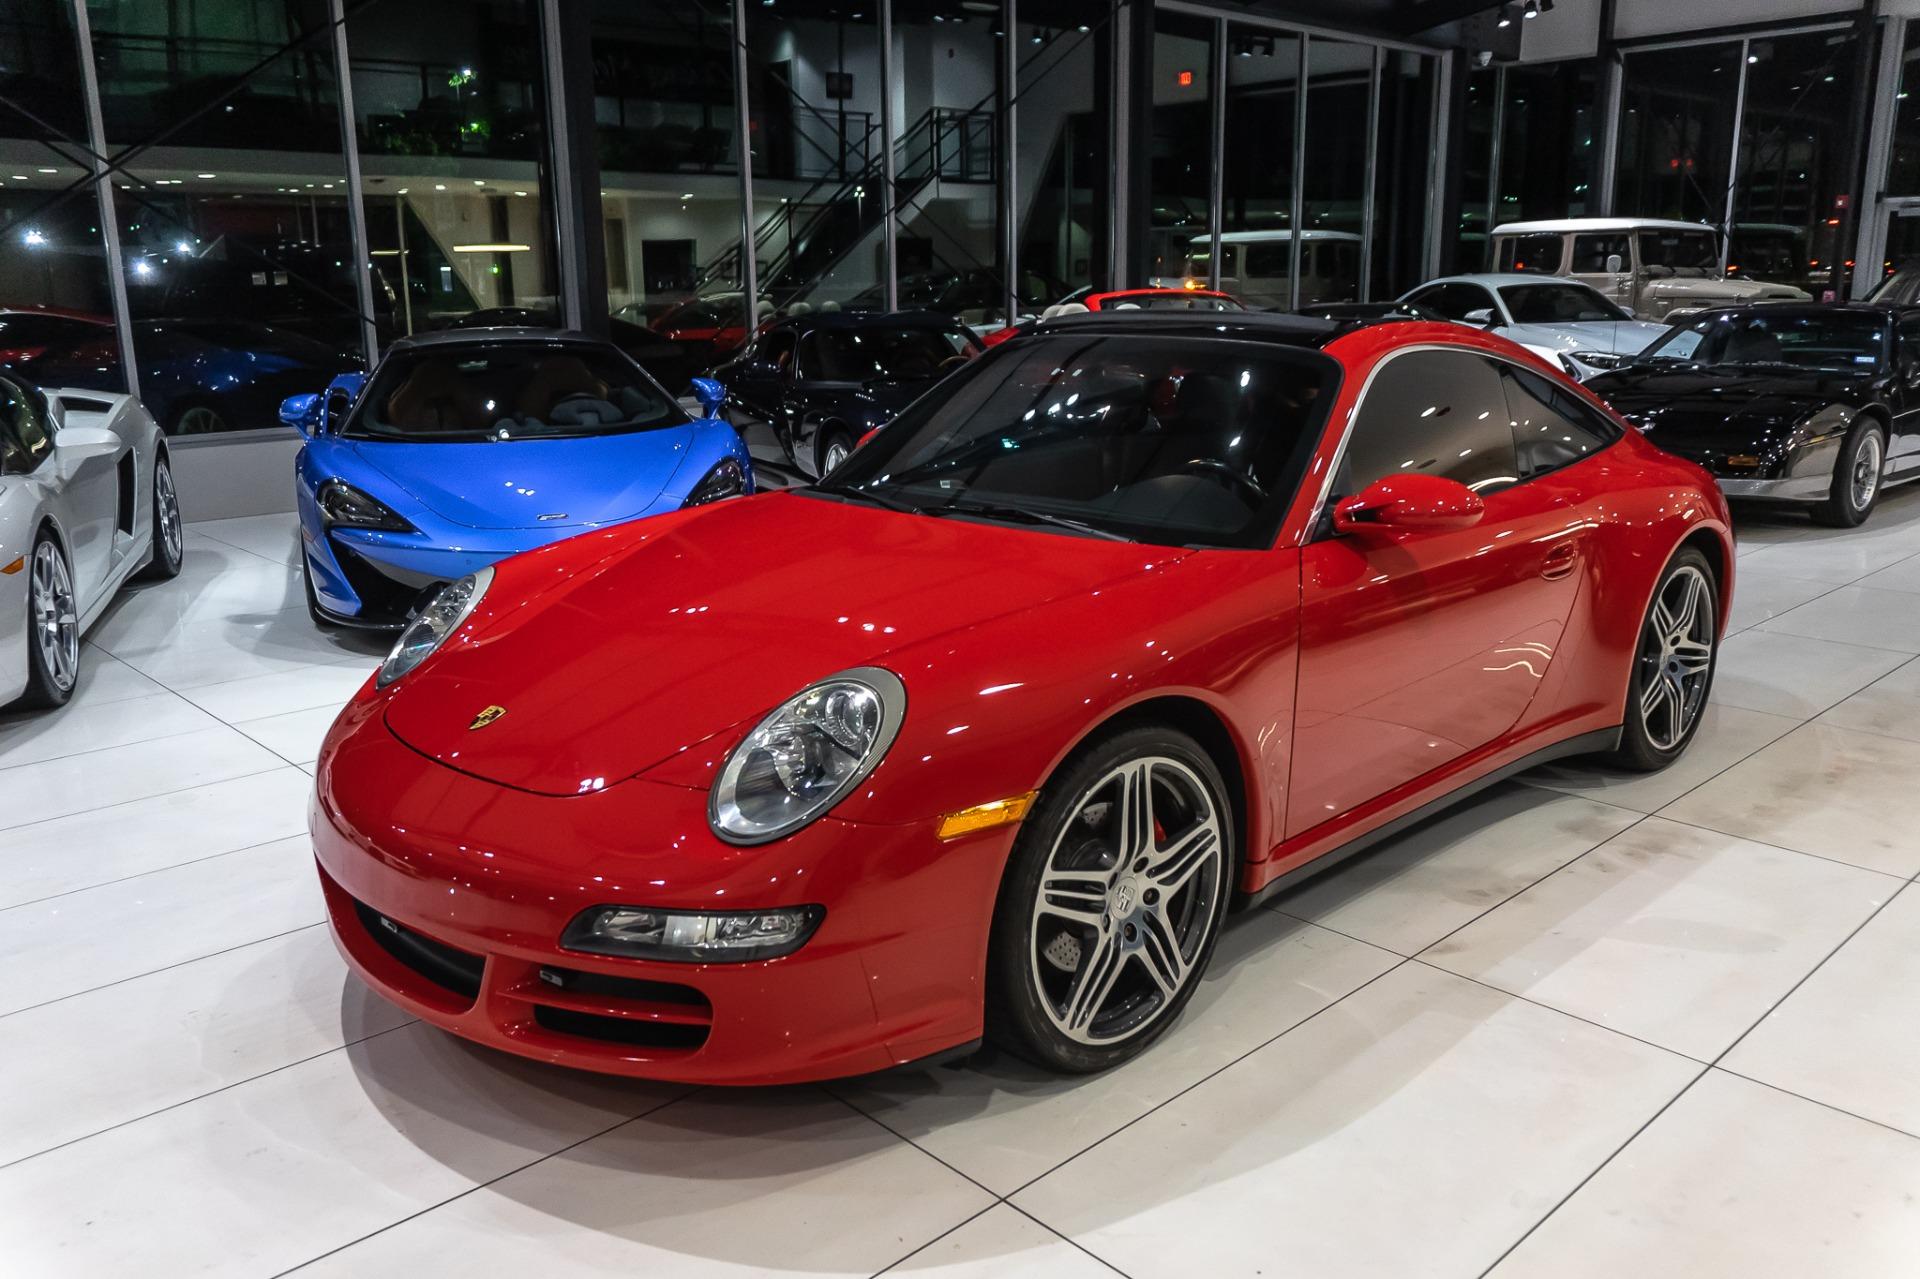 Used-2007-Porsche-911-Targa-4-Coupe-6-SPEED-MANUAL-TURBO-WHEELS-BOSE-SOUND